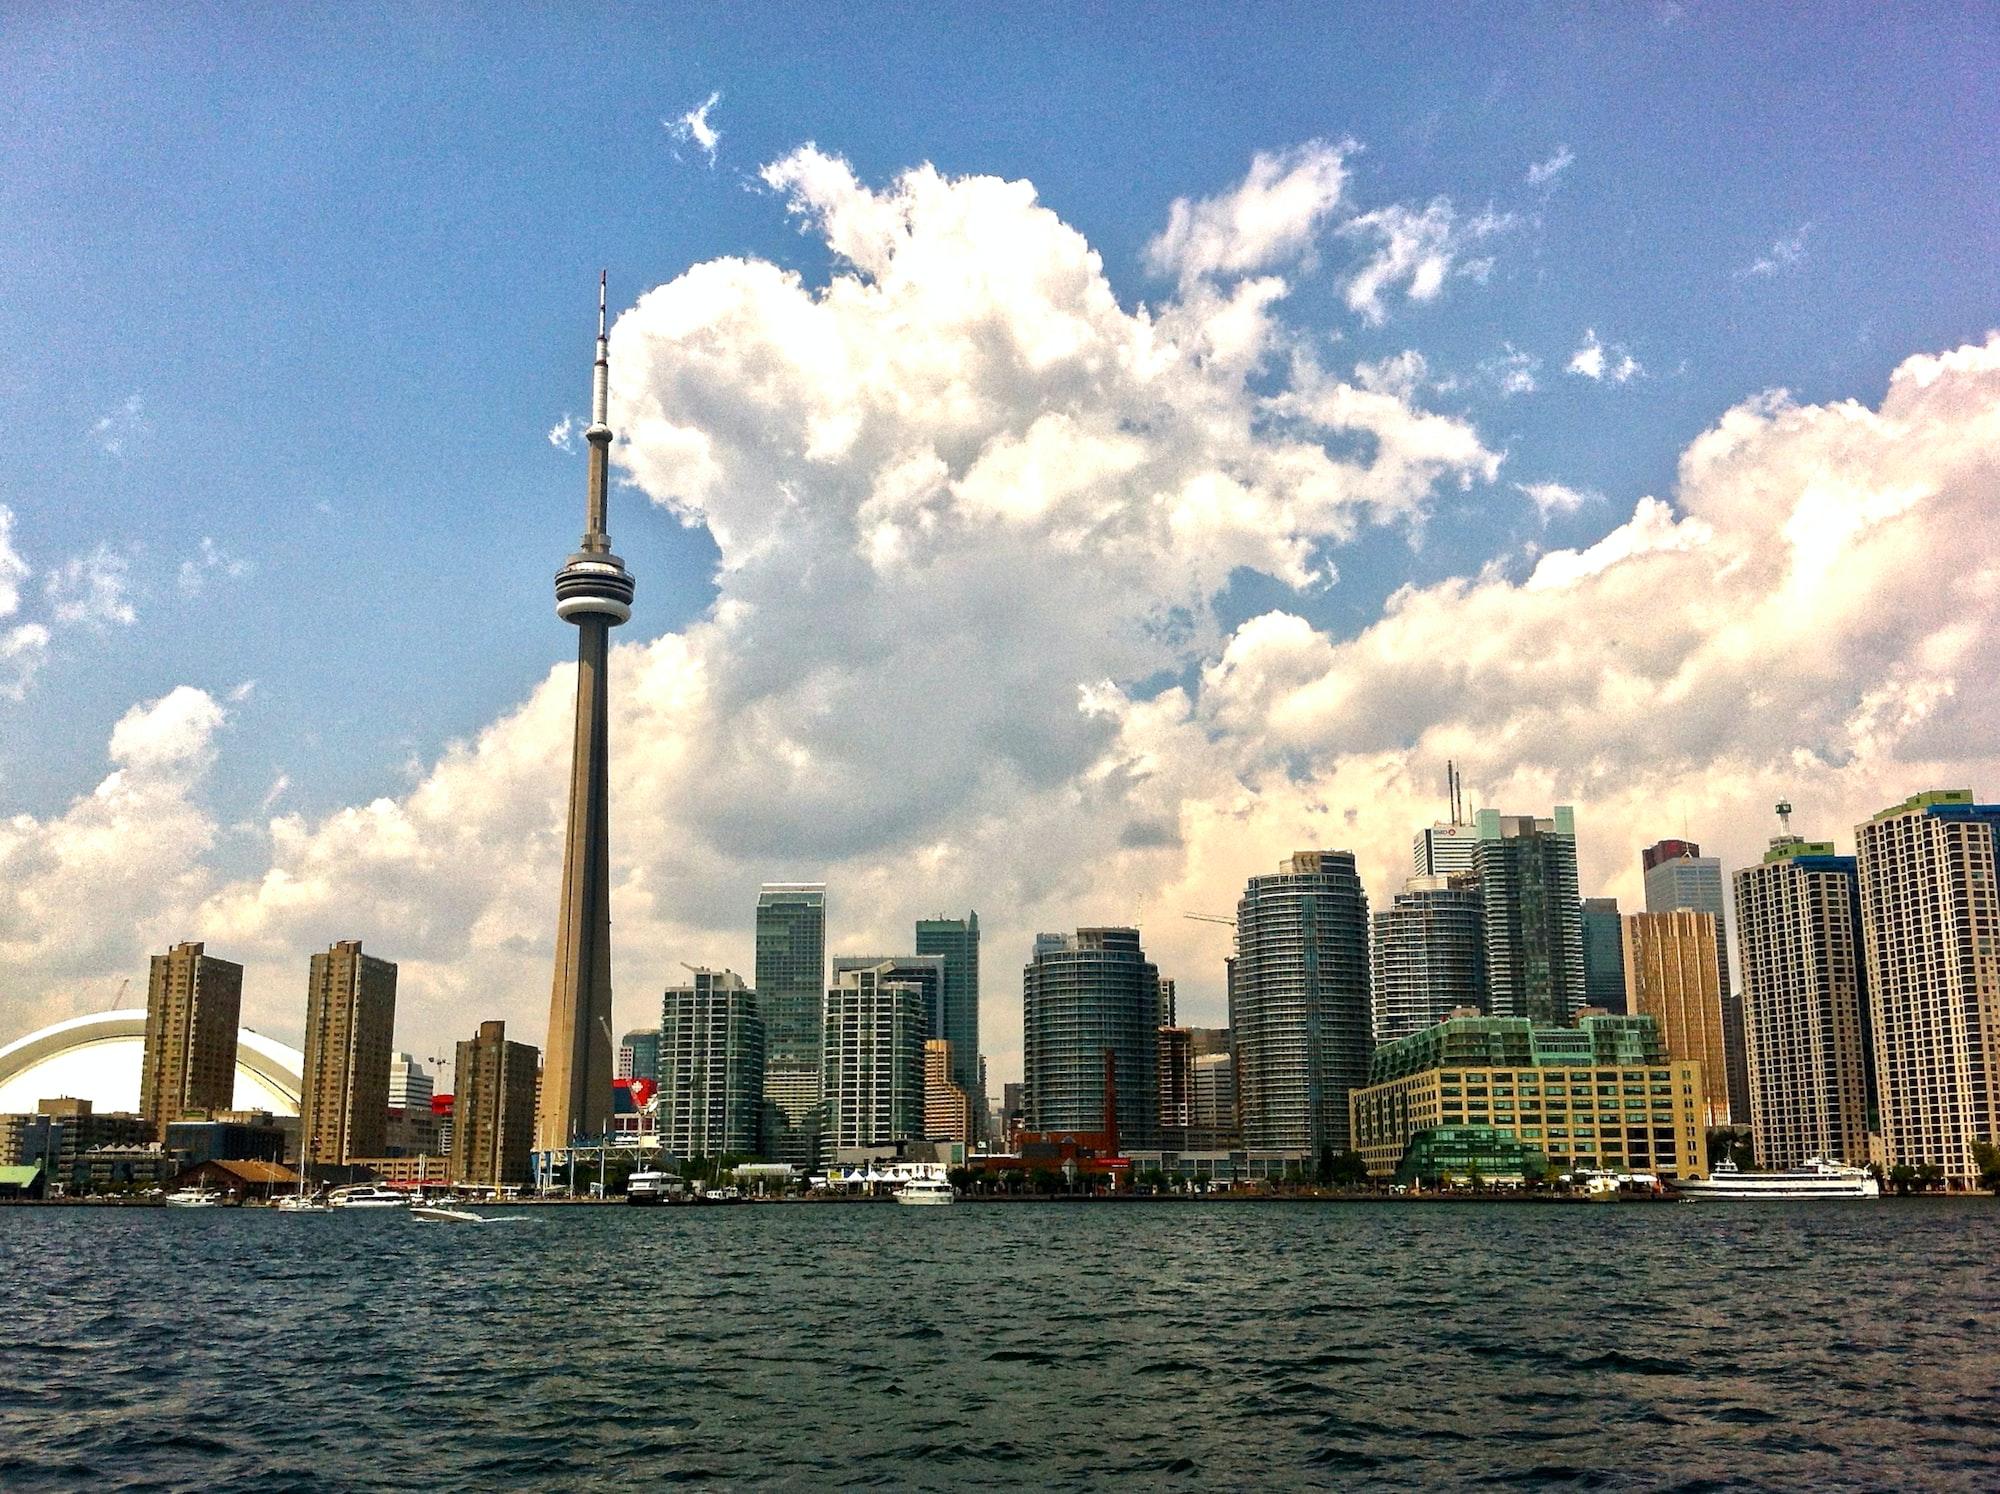 Toronto skyline from harbour